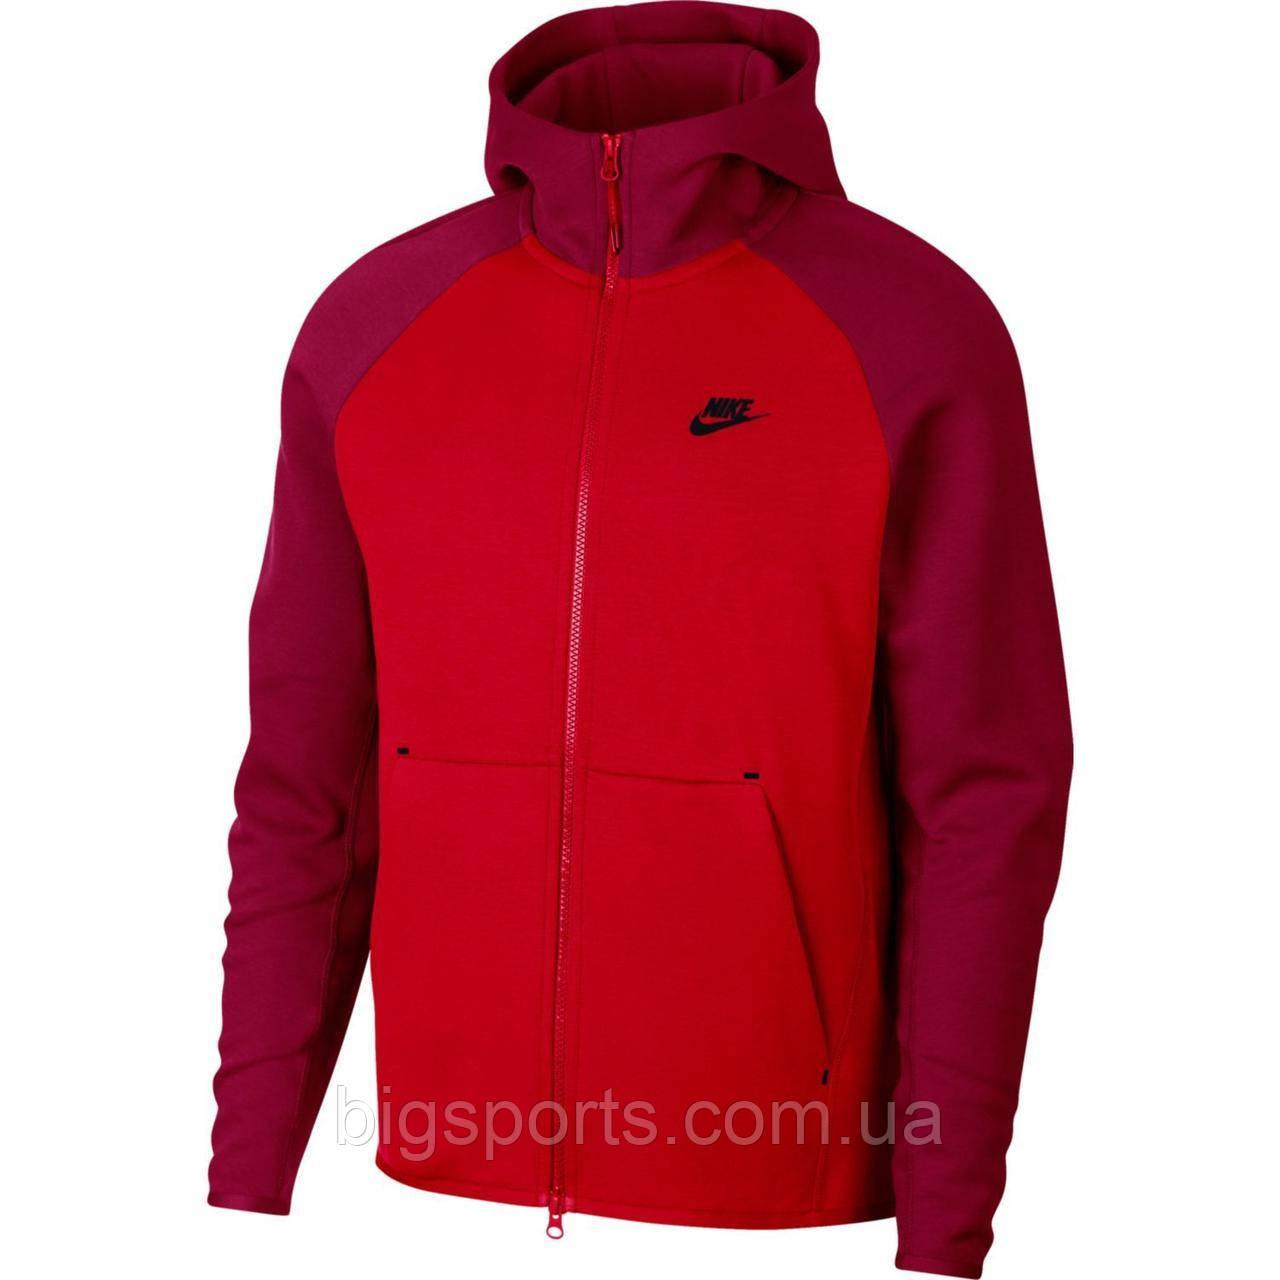 ed9417f0 Кофта муж. Nike M Nsw Tch Flc Hoodie Fz (арт. 928483-657), цена 2 ...